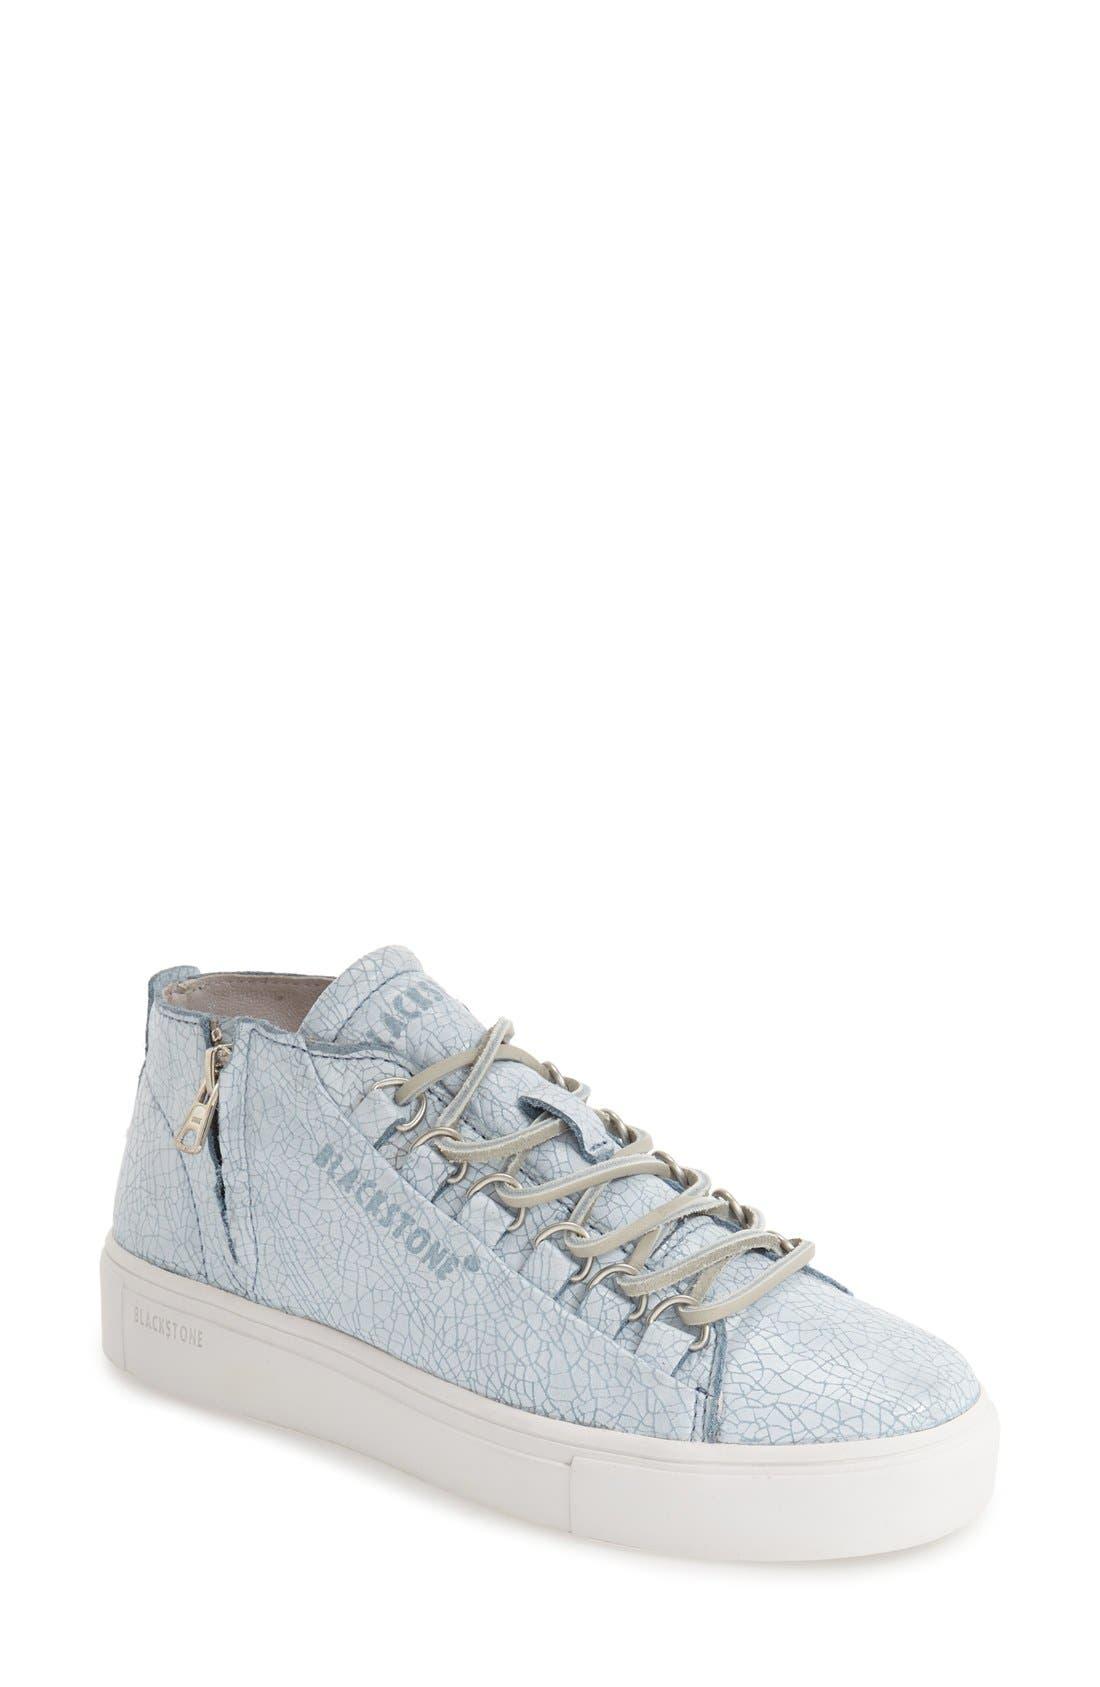 Alternate Image 1 Selected - Blackstone 'LL60' Midi Sneaker (Women)